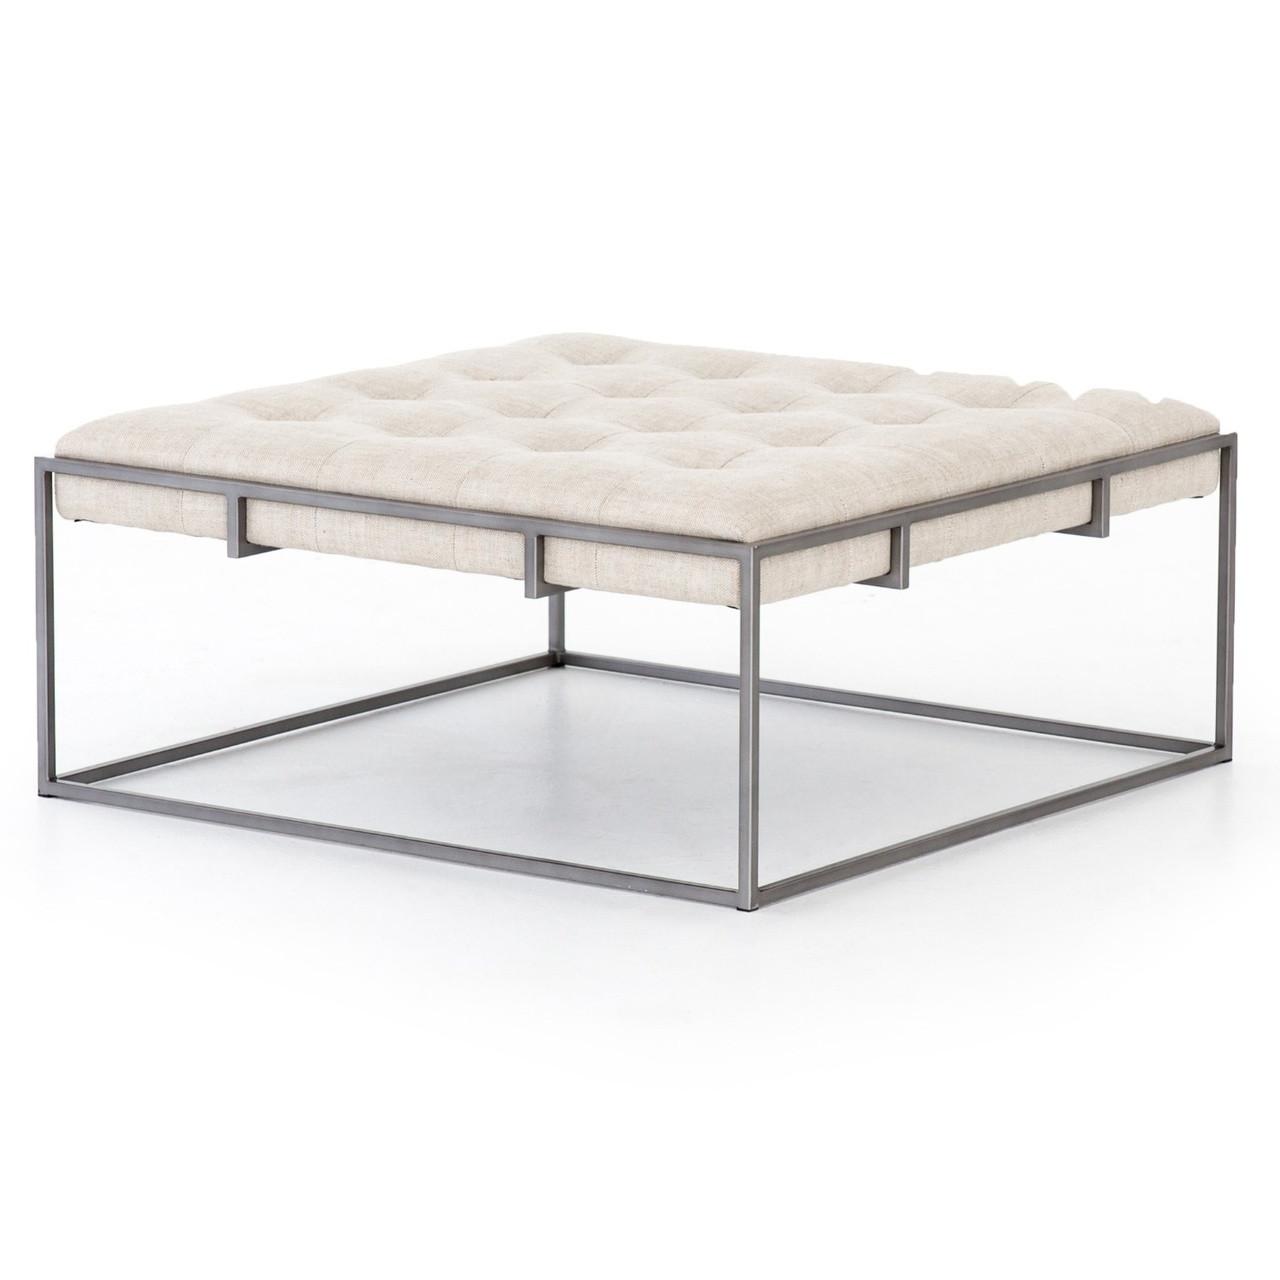 Peachy Oxford Tufted Linen Square Ottoman Coffee Table 36 Machost Co Dining Chair Design Ideas Machostcouk